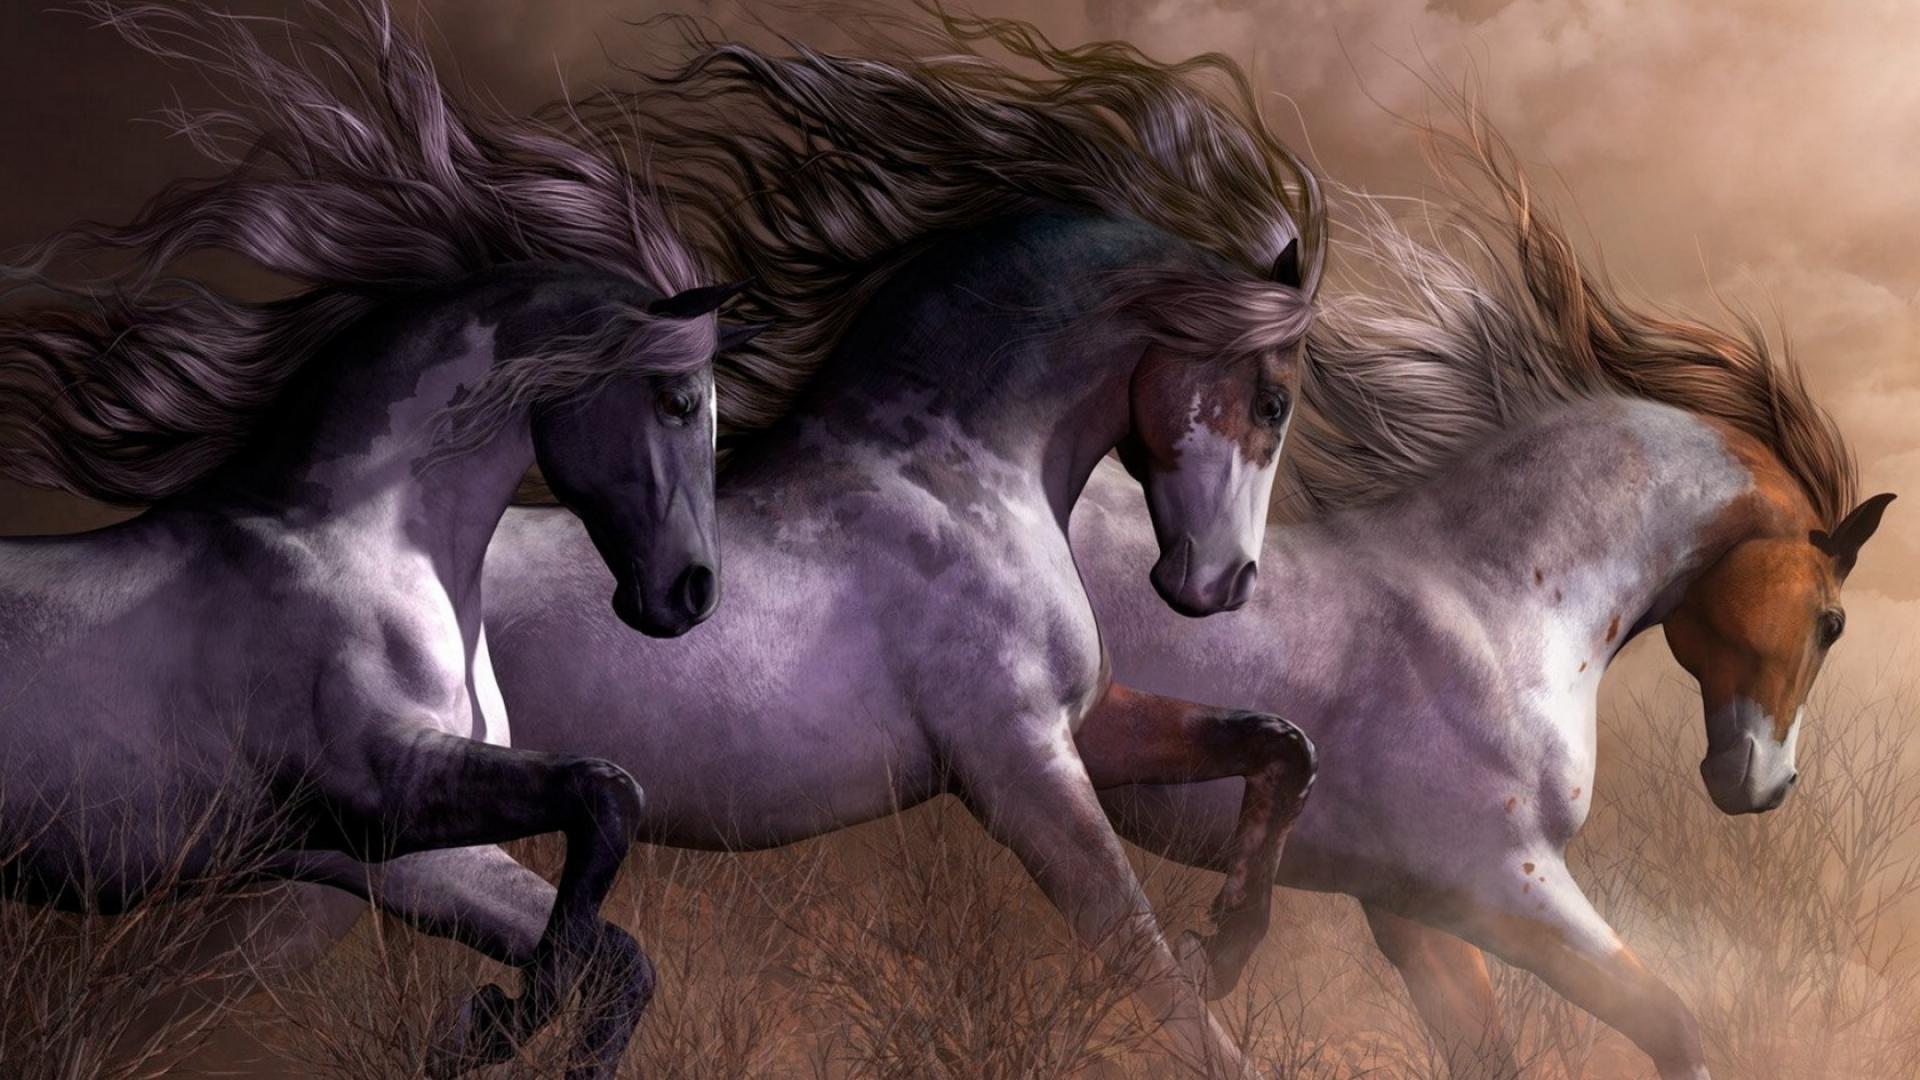 Best Wallpaper Horse Wall - horses_art_poster_painting_animal_digital_1920x1080_hd-wallpaper-1911020  Pictures_469891.jpg